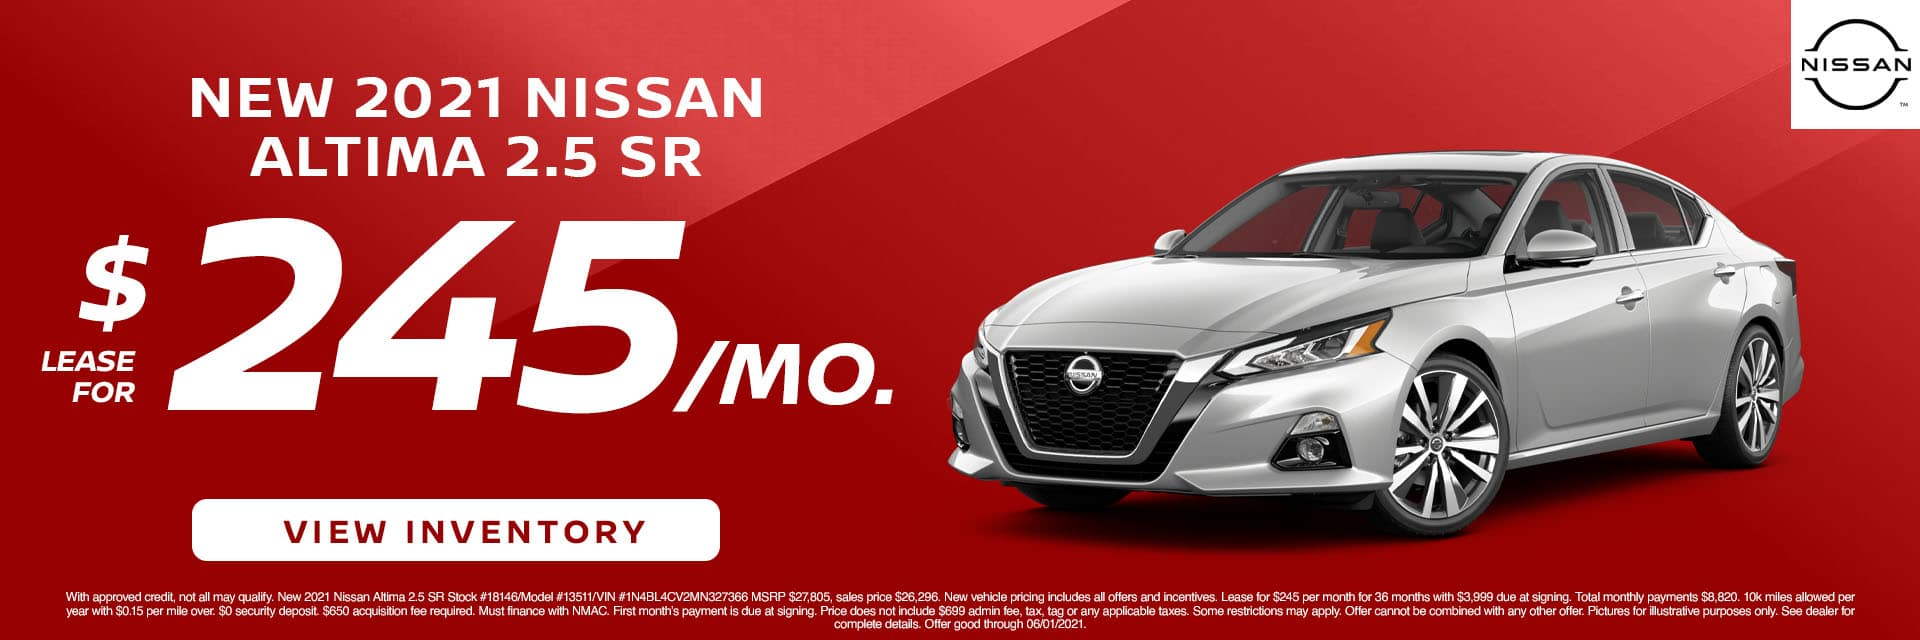 CNSN-May 2021-2021 Nissan Altima